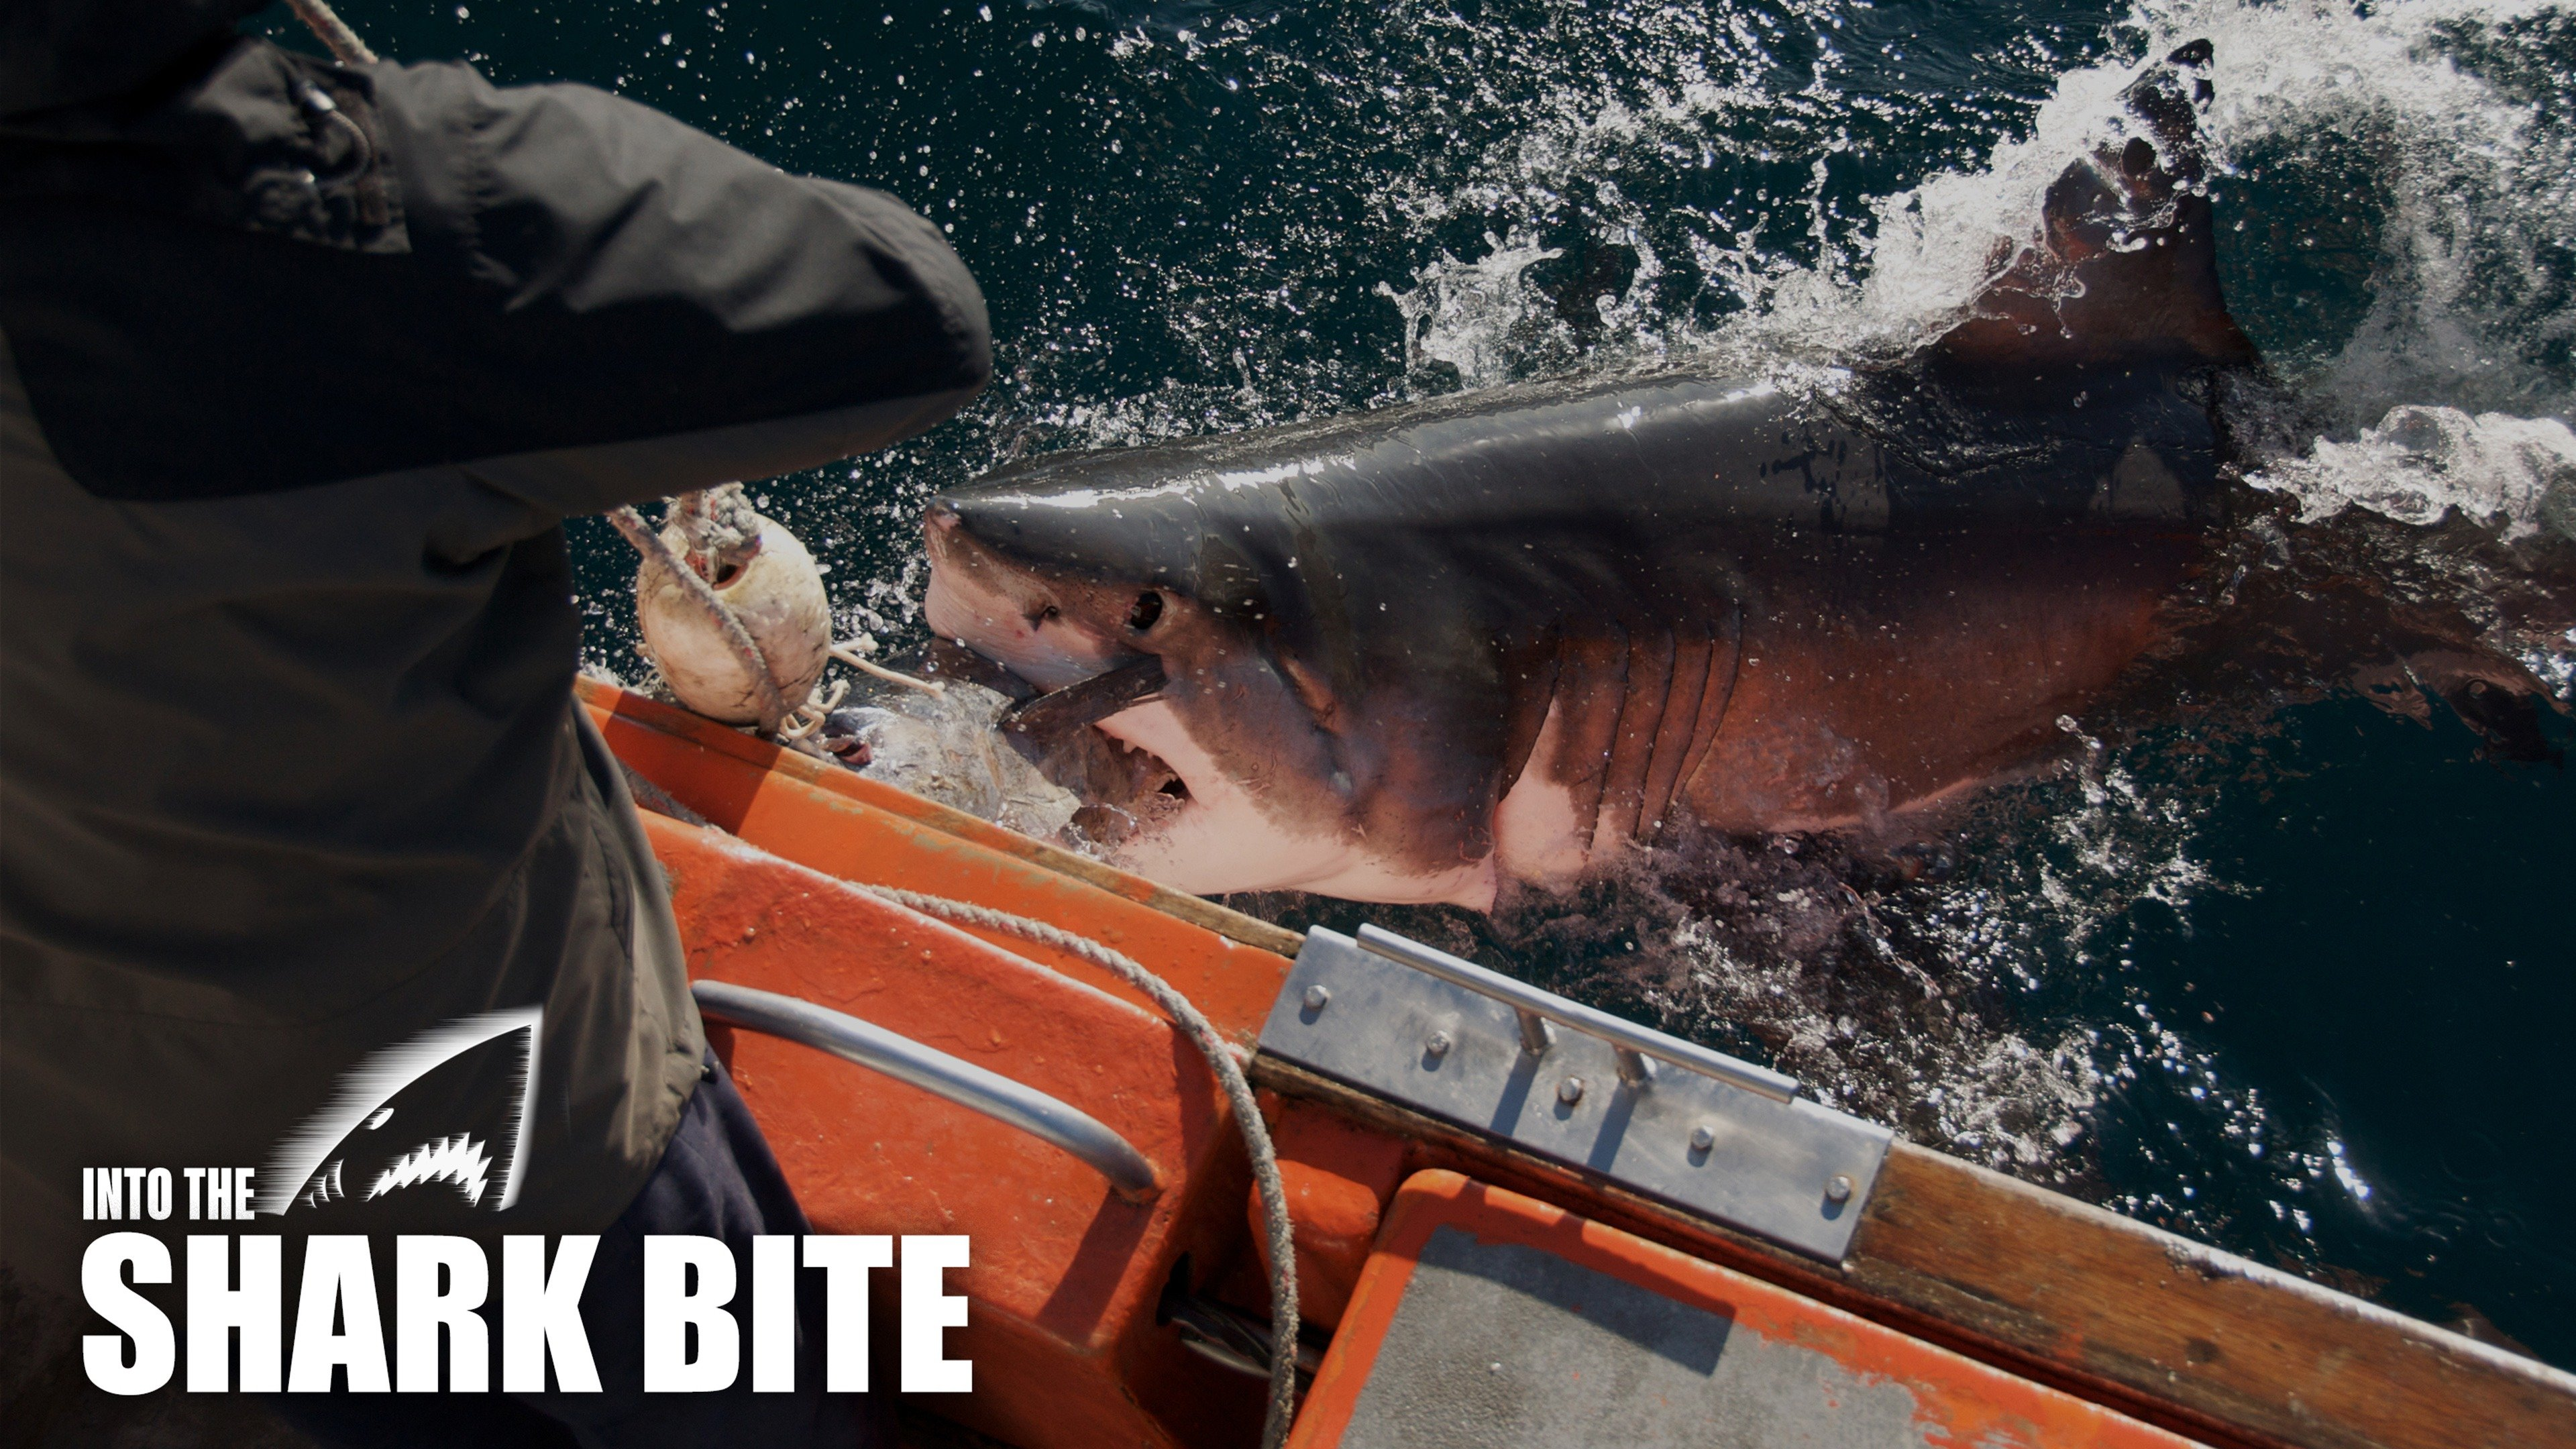 Into the Shark Bite